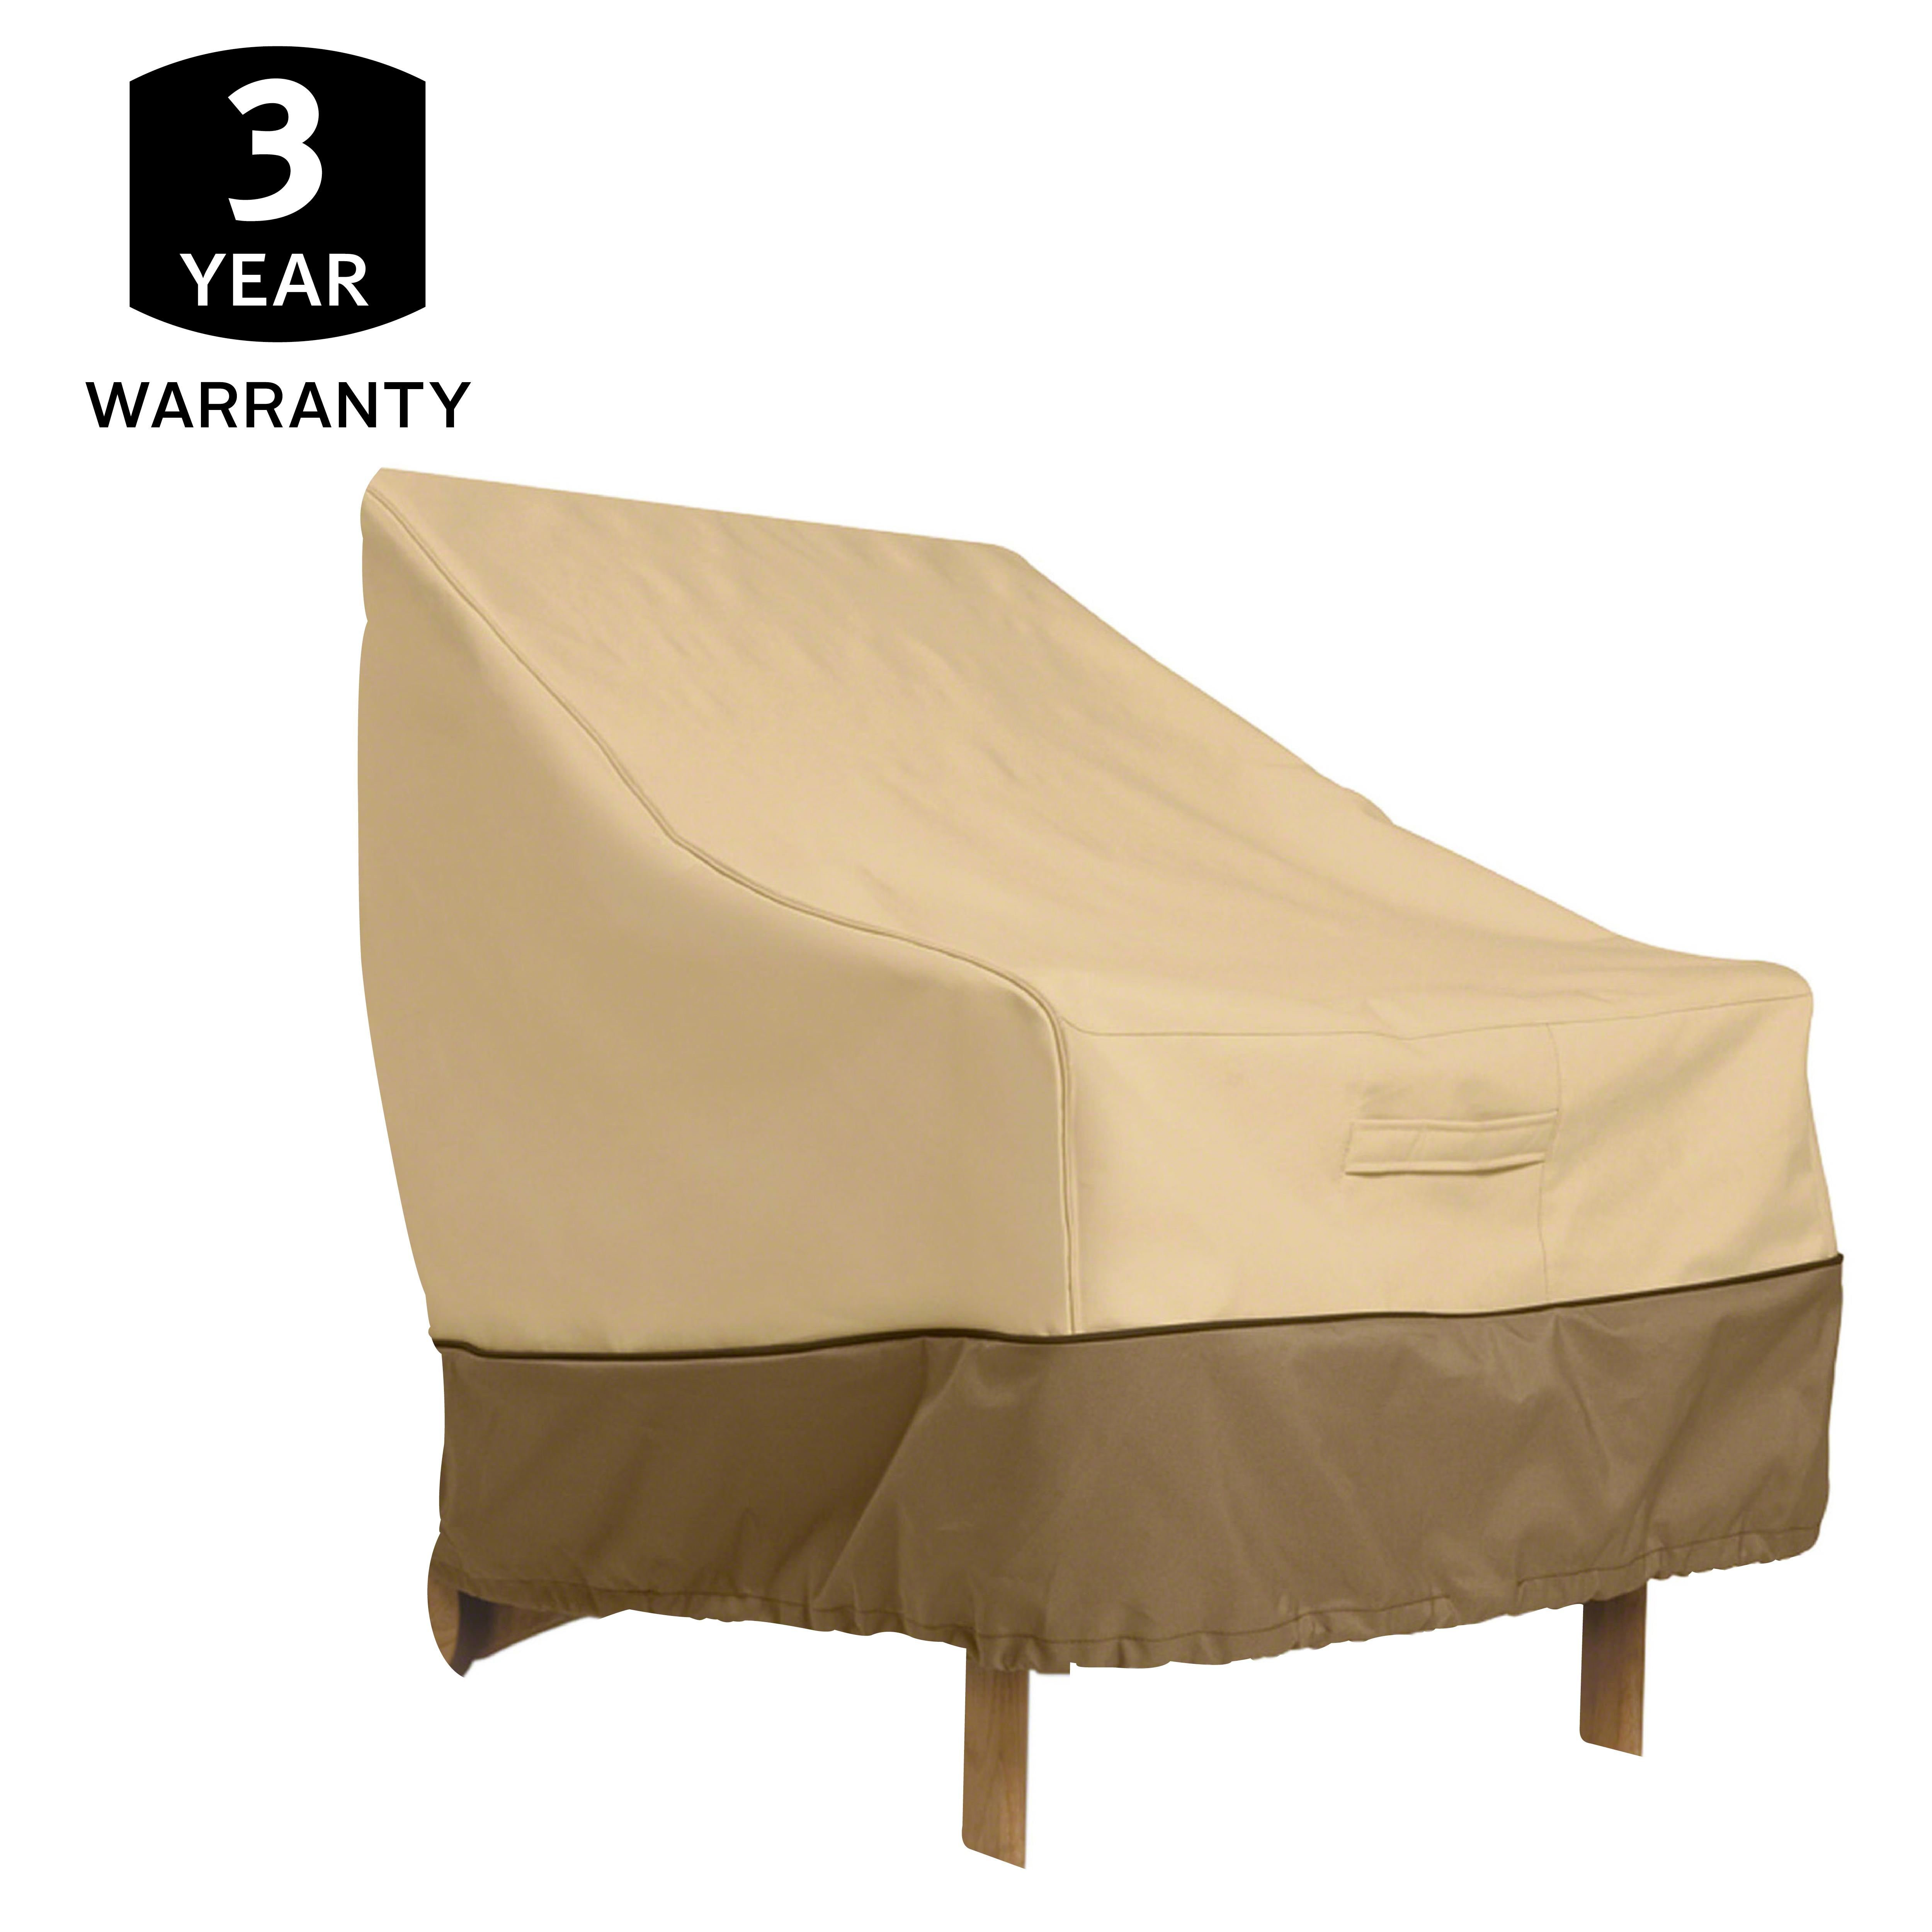 Amazoncom  Classic Accessories Veranda Patio Lounge